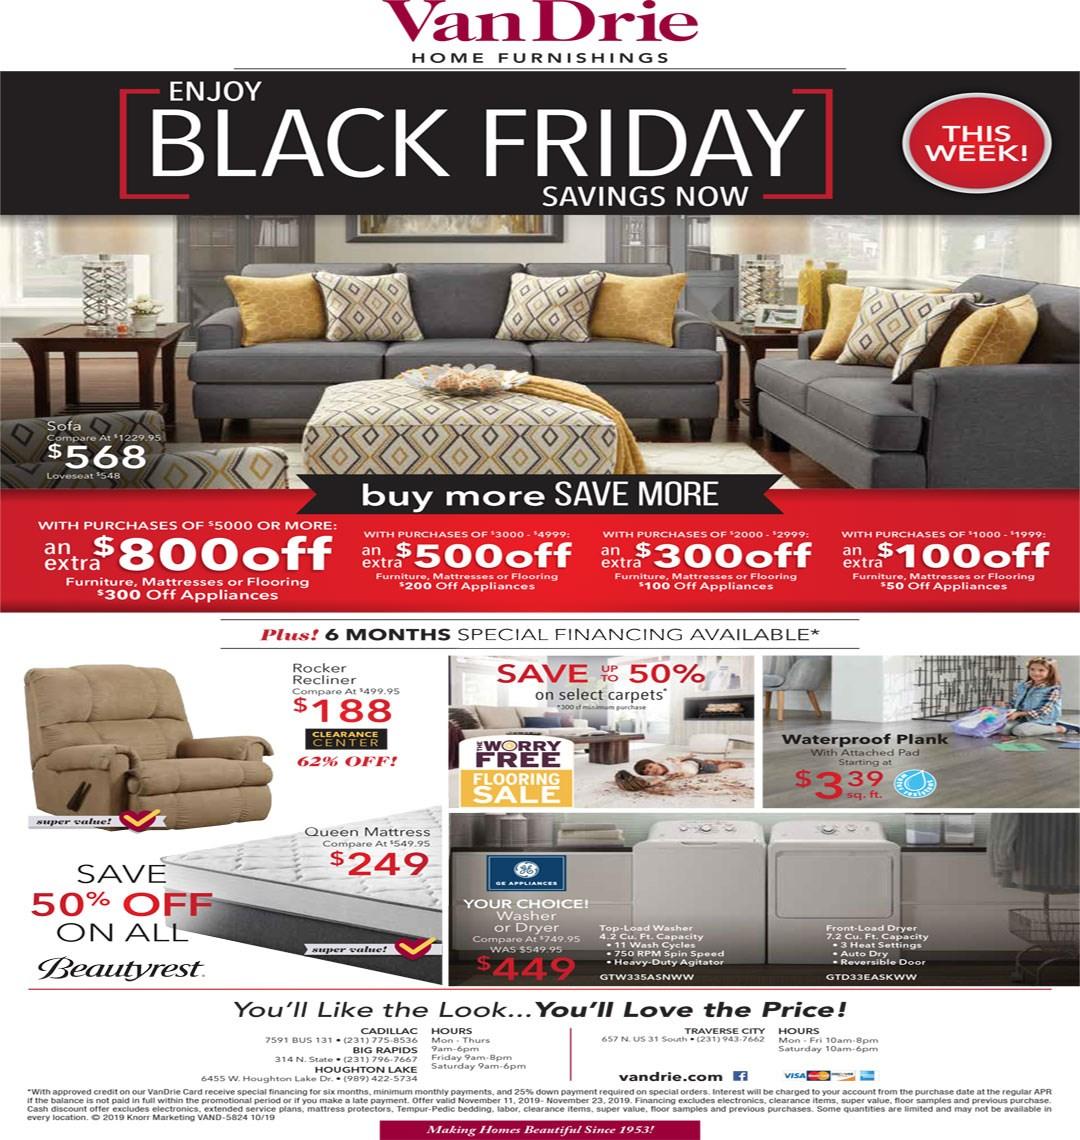 Black Friday Buy More